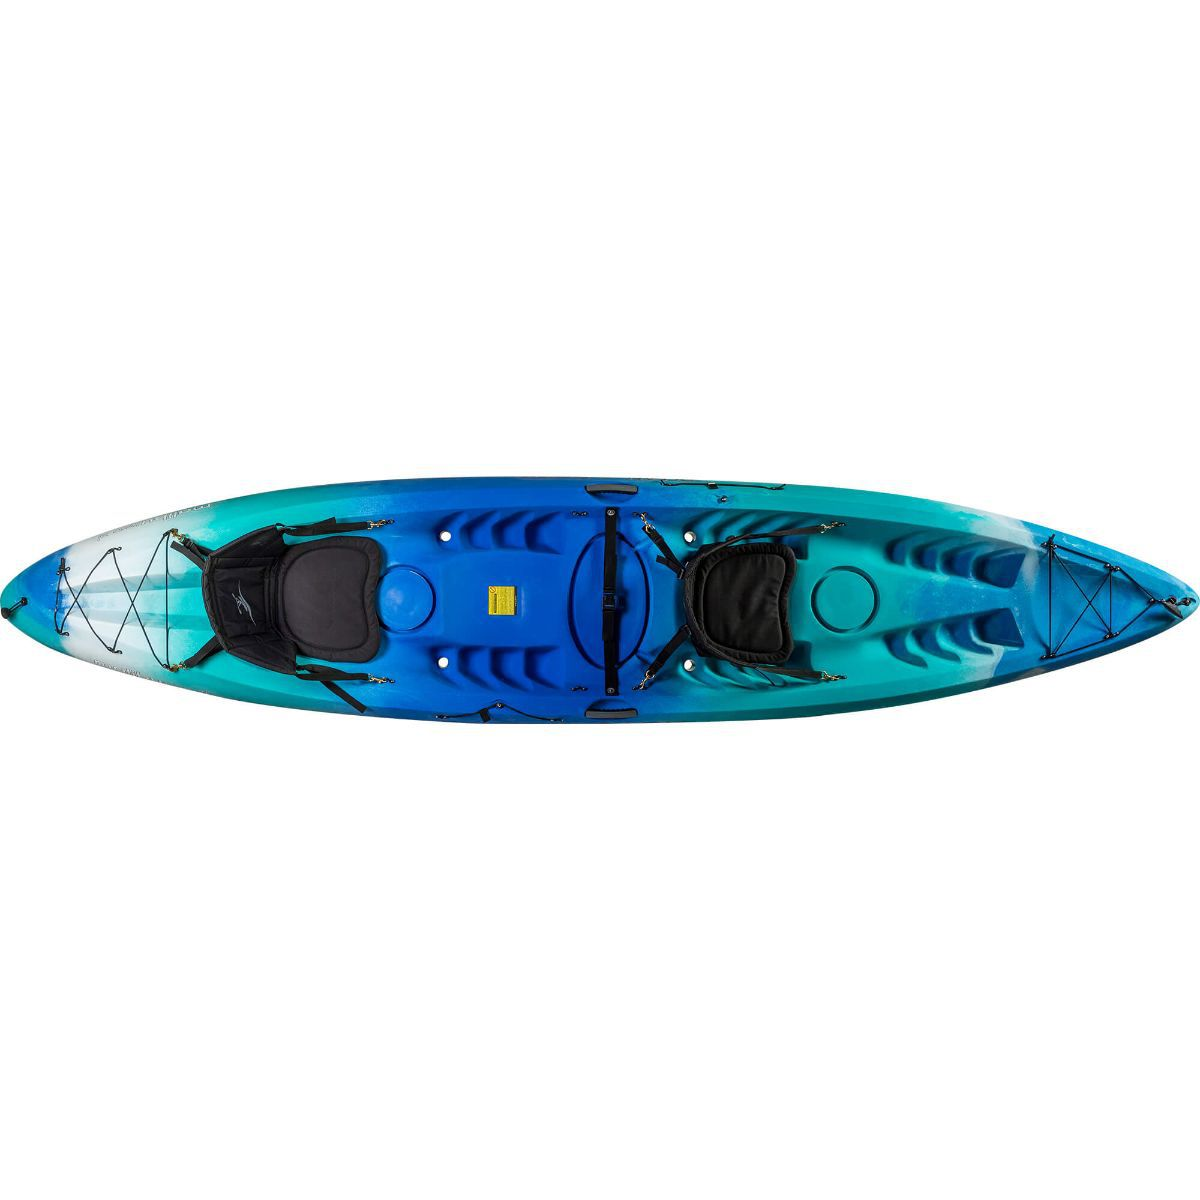 Ocean Kayak Malibu 2XL Tandem Kayak